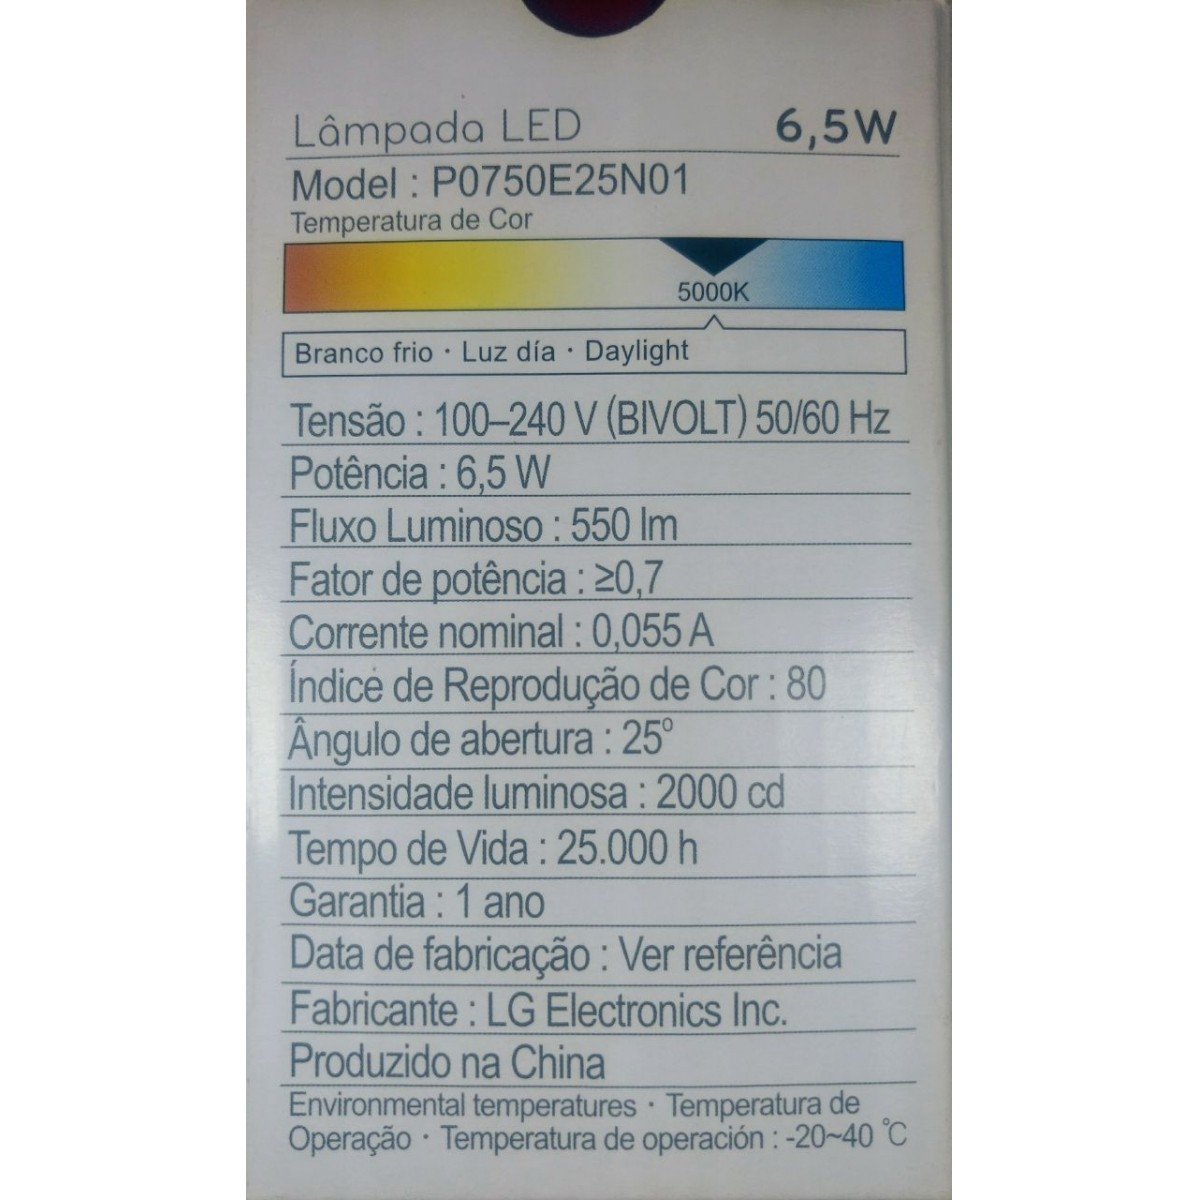 Lâmpada LED Par20 6,5W bivolt E27 5000K LG Par 20